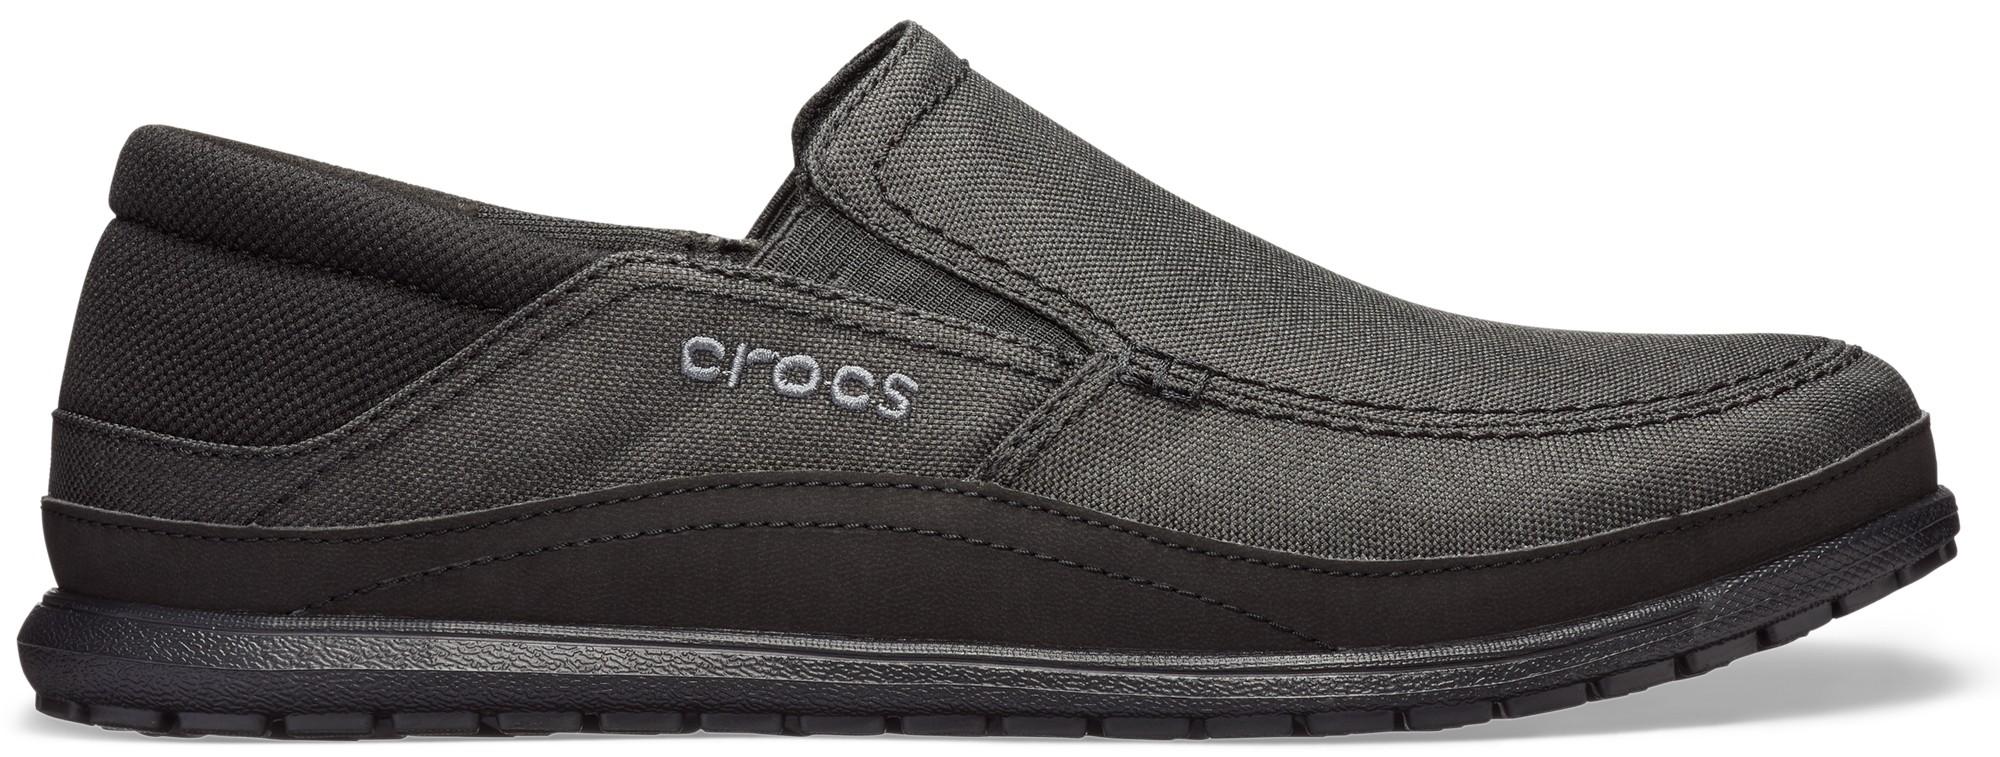 Crocs™ Santa Cruz Playa Slip-On Black/Black 47,5